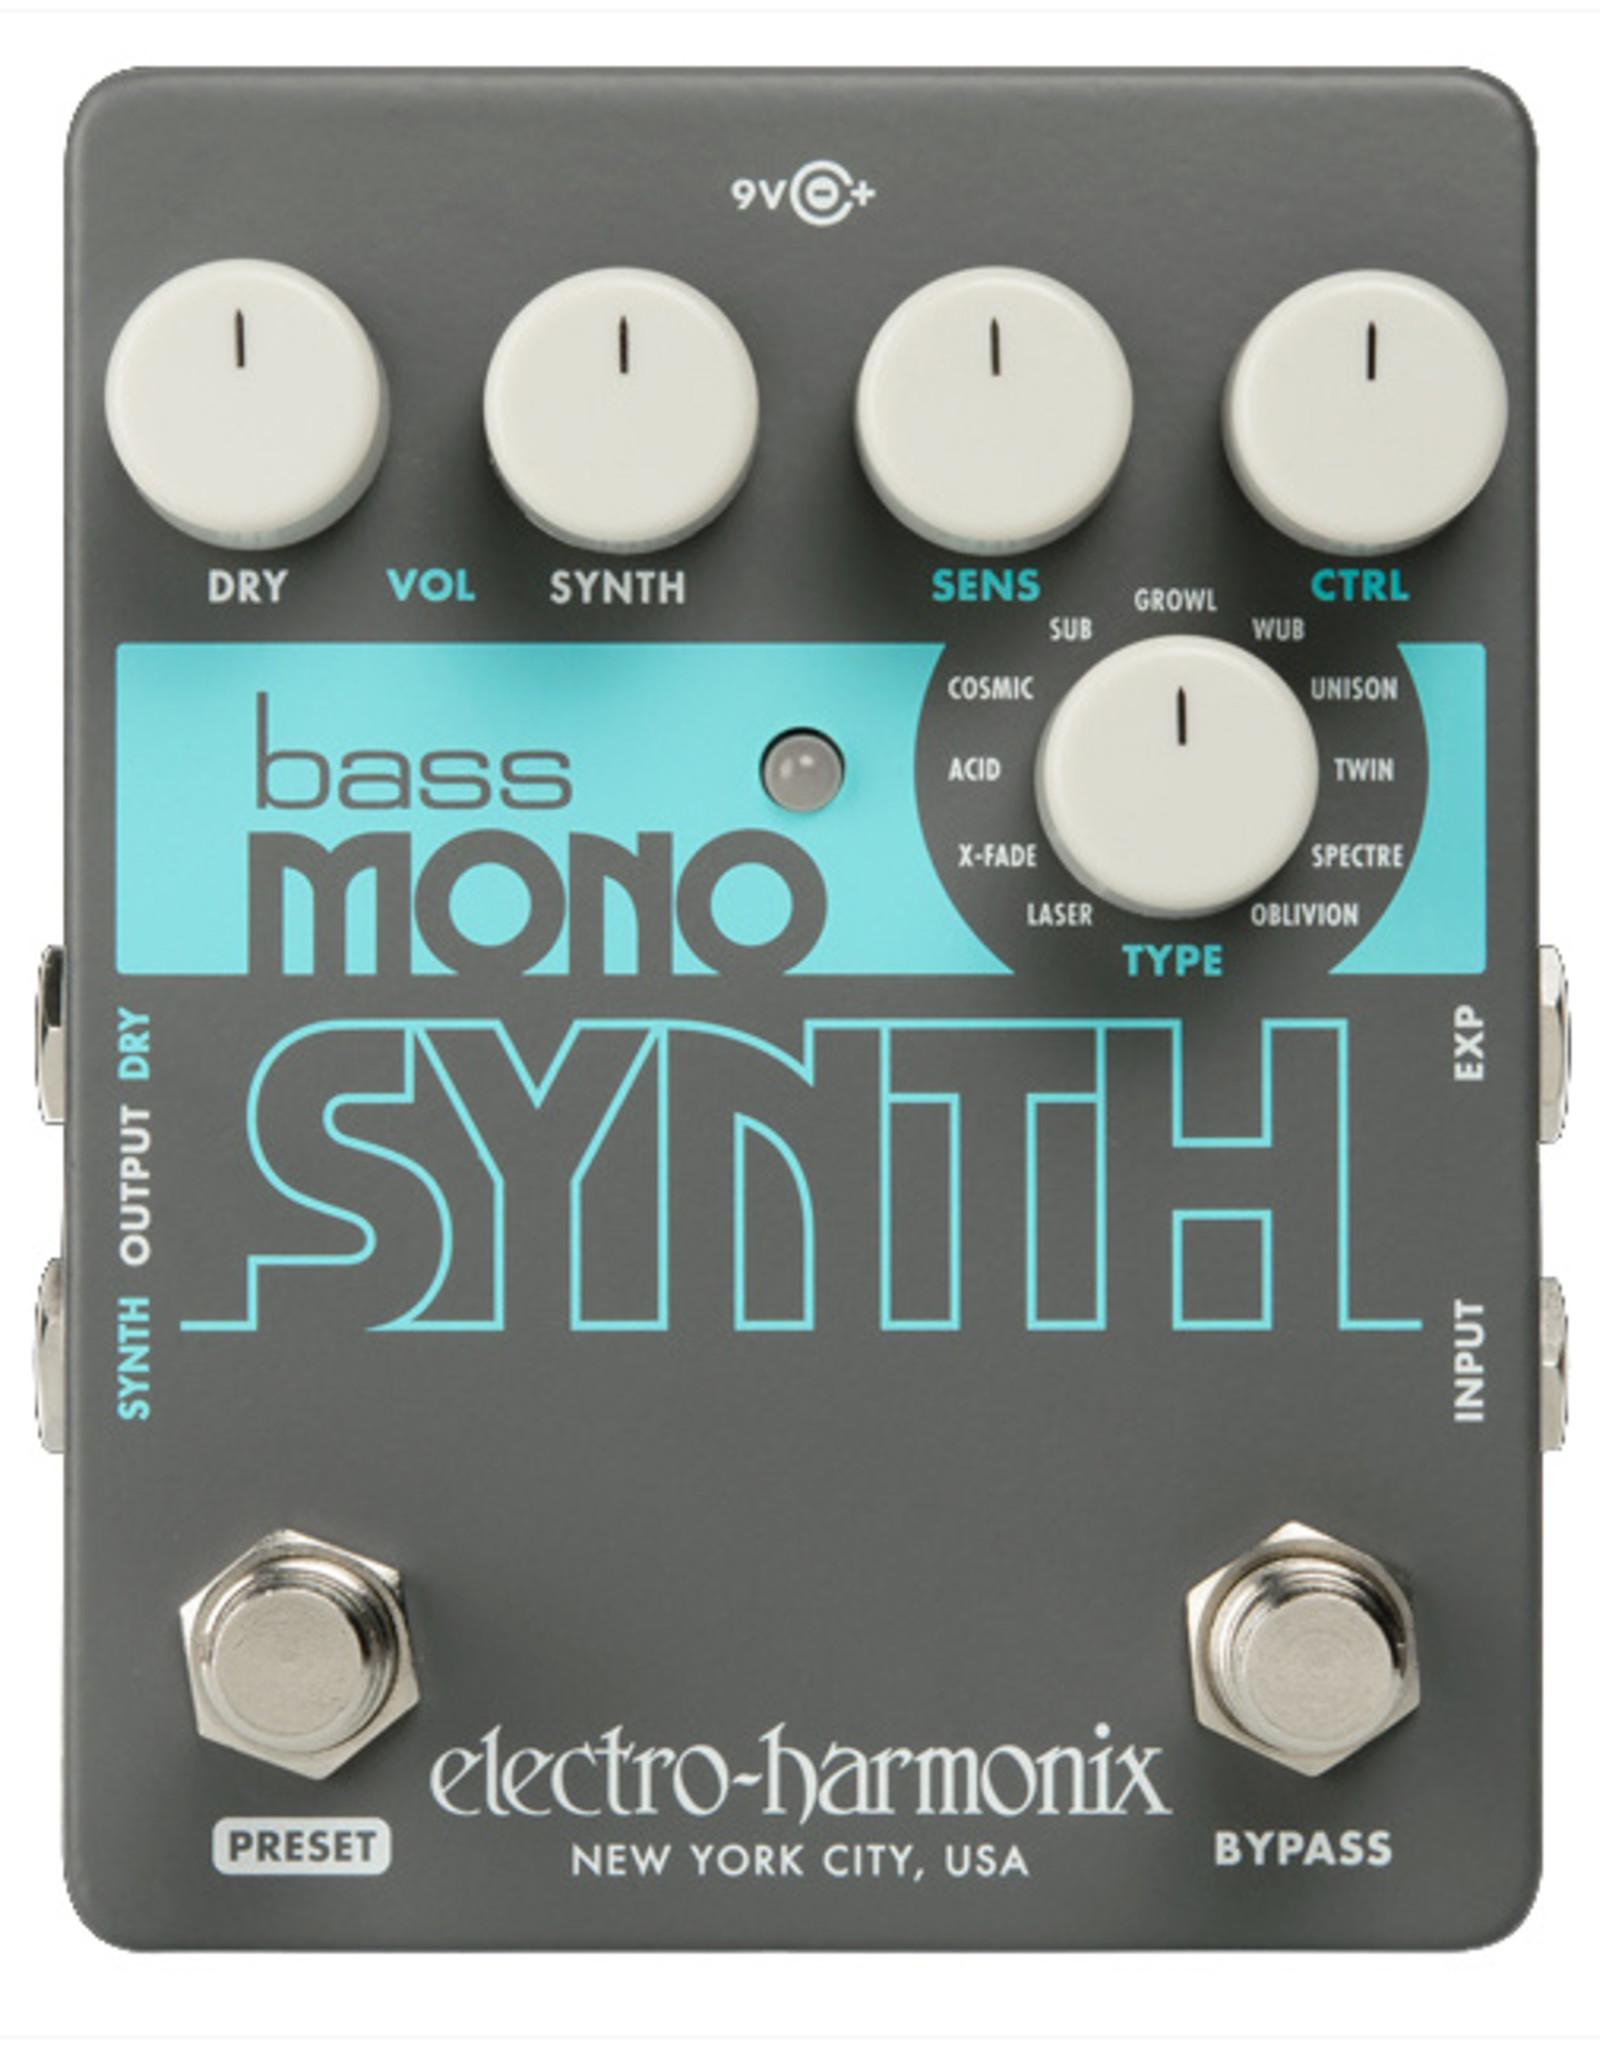 Electro-Harmonix EHX BASS MONO SYNTH, 9.6 DC-200 PSU Included